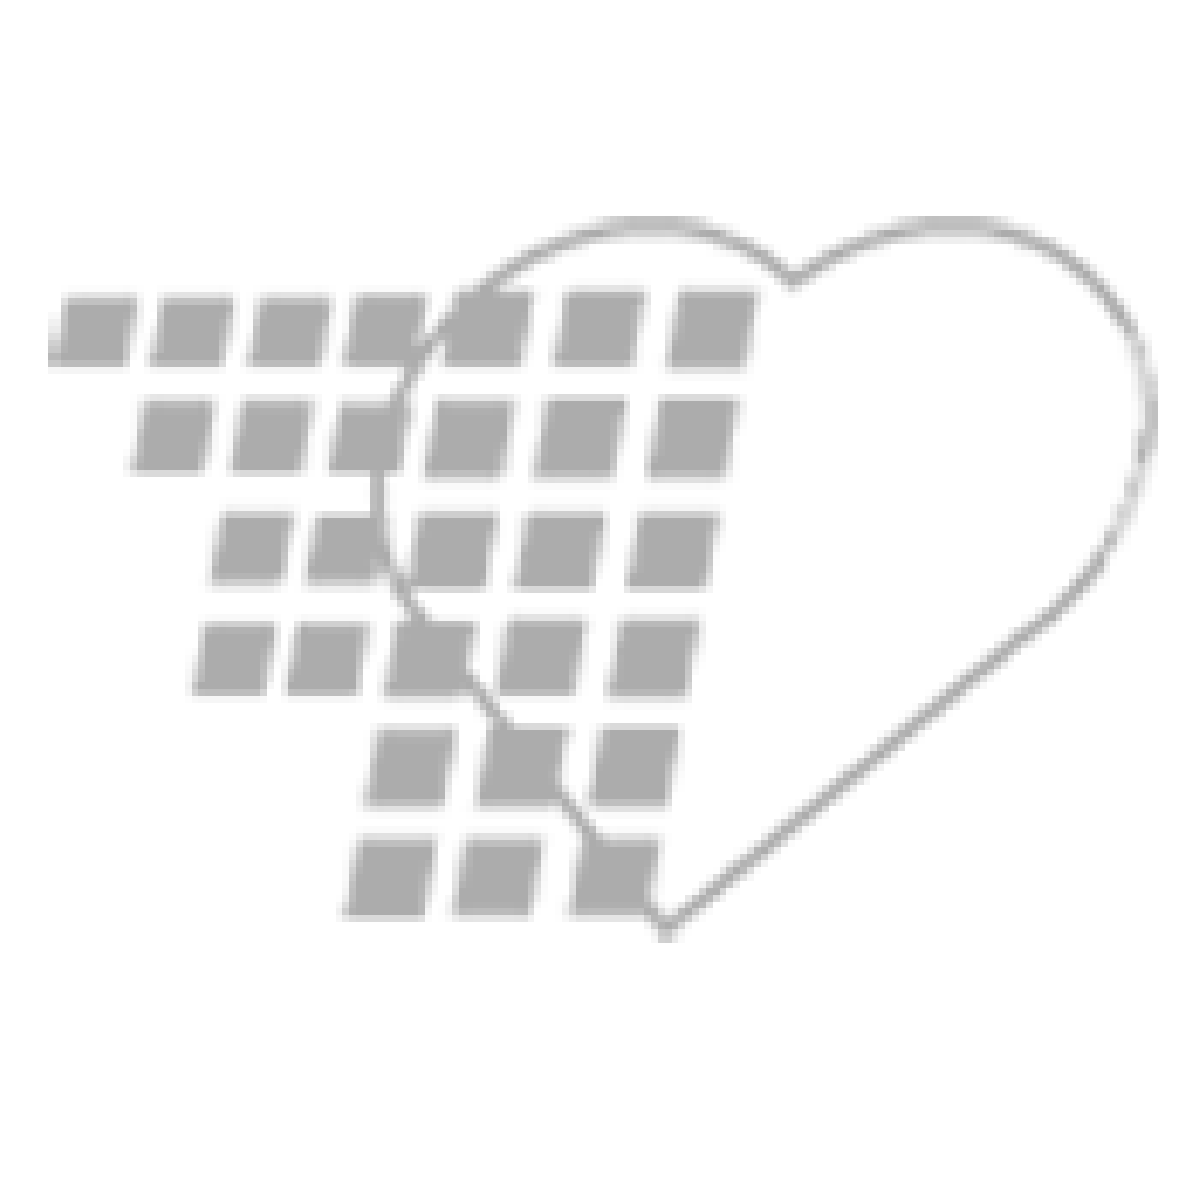 06-93-6025 Demo Dose® Totl Parenterl Nutritin with Lipds